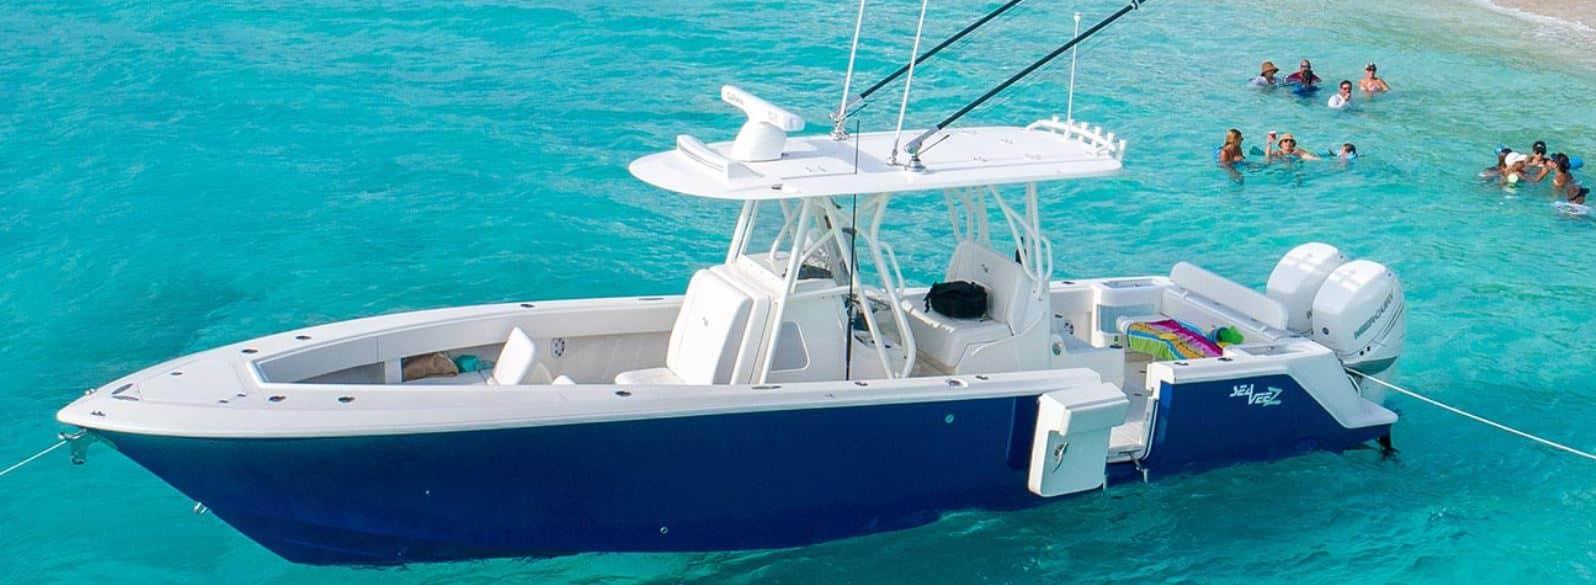 SeaVee 320